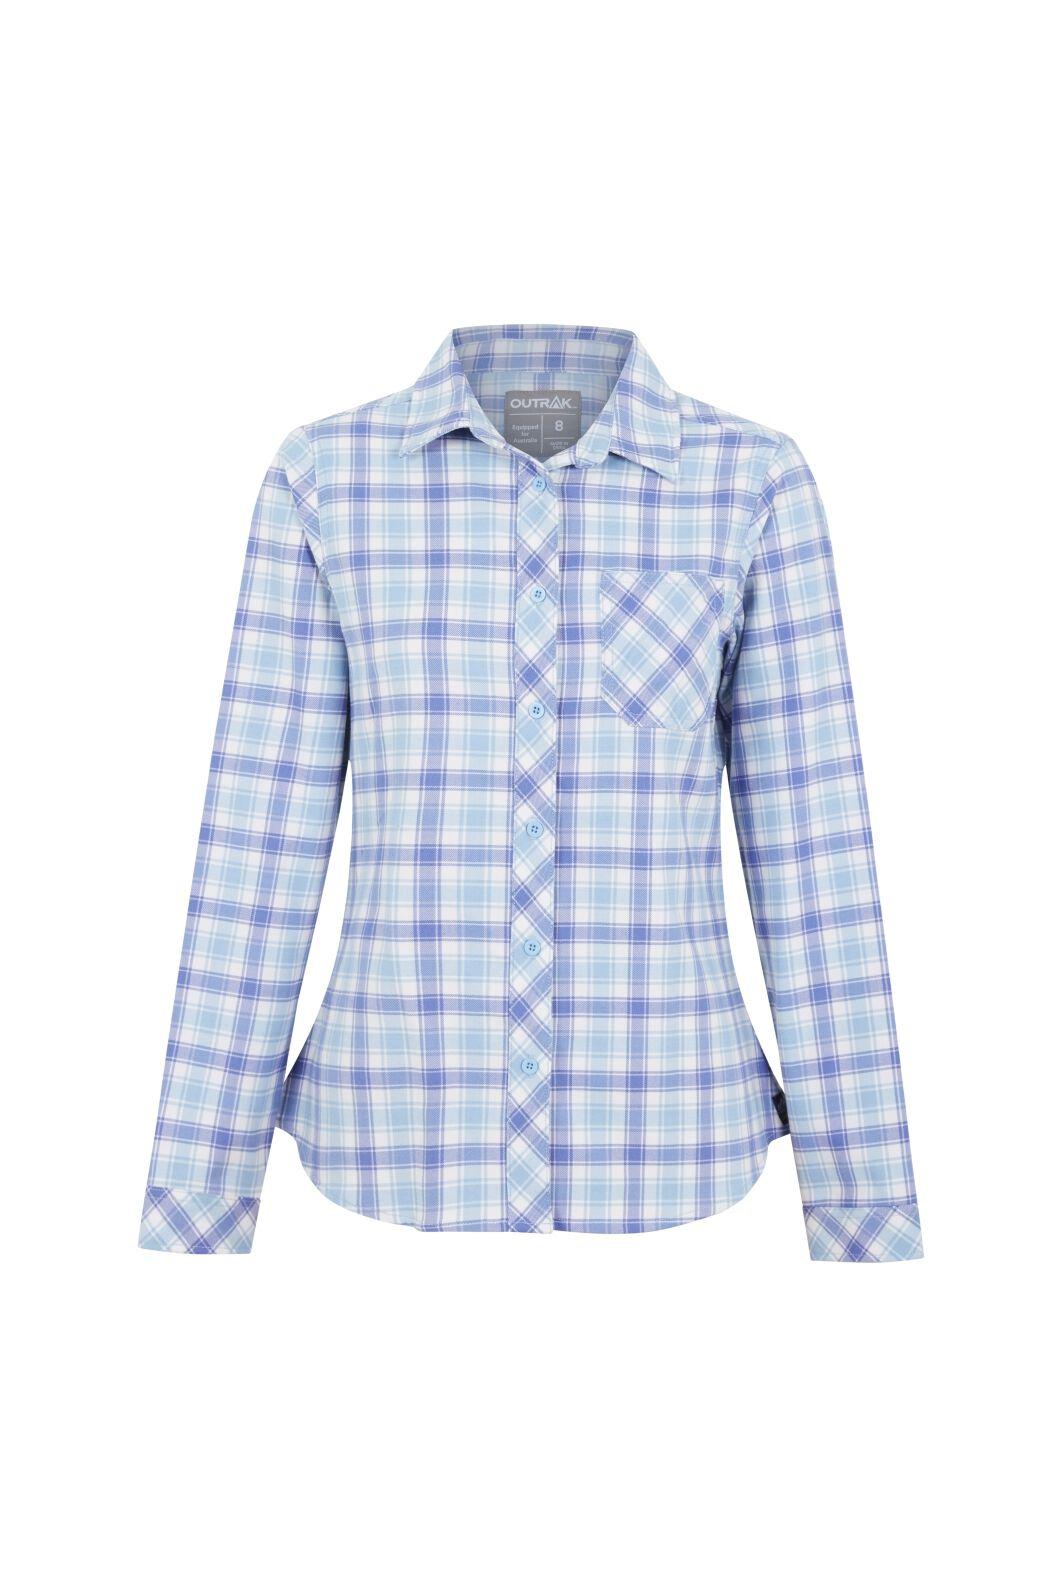 Outrak Women's Alpine Check Long Sleeve Shirt  Check, Blue Check, hi-res